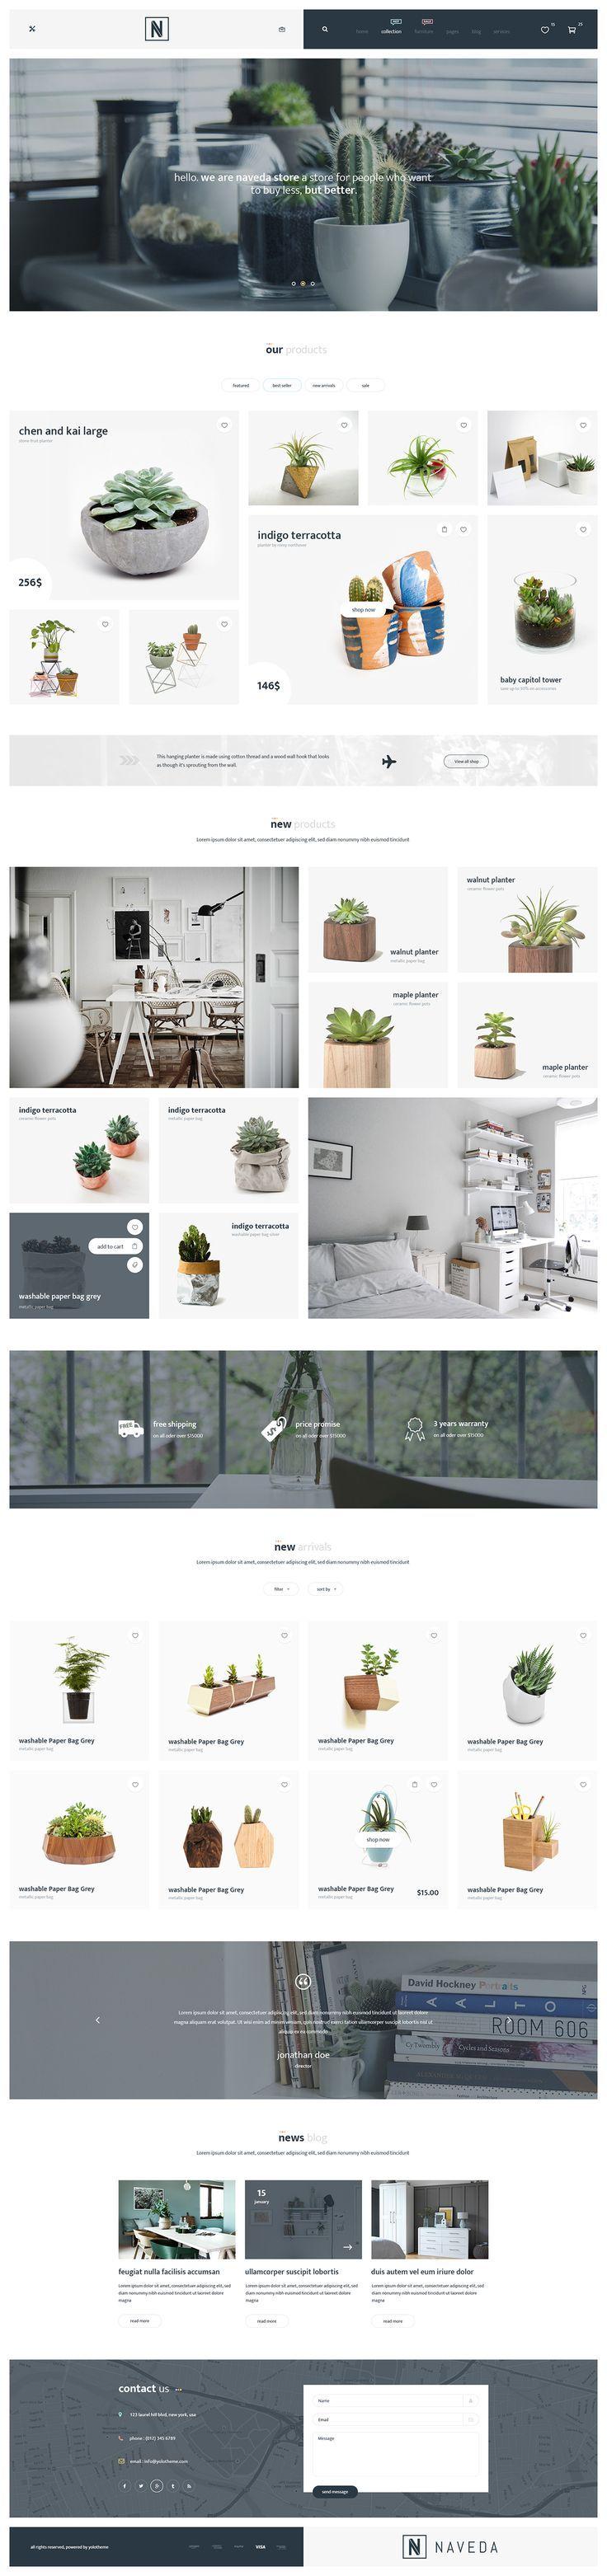 Naveda Creative PSD Template on Behance Latest News & Trends on webdesign